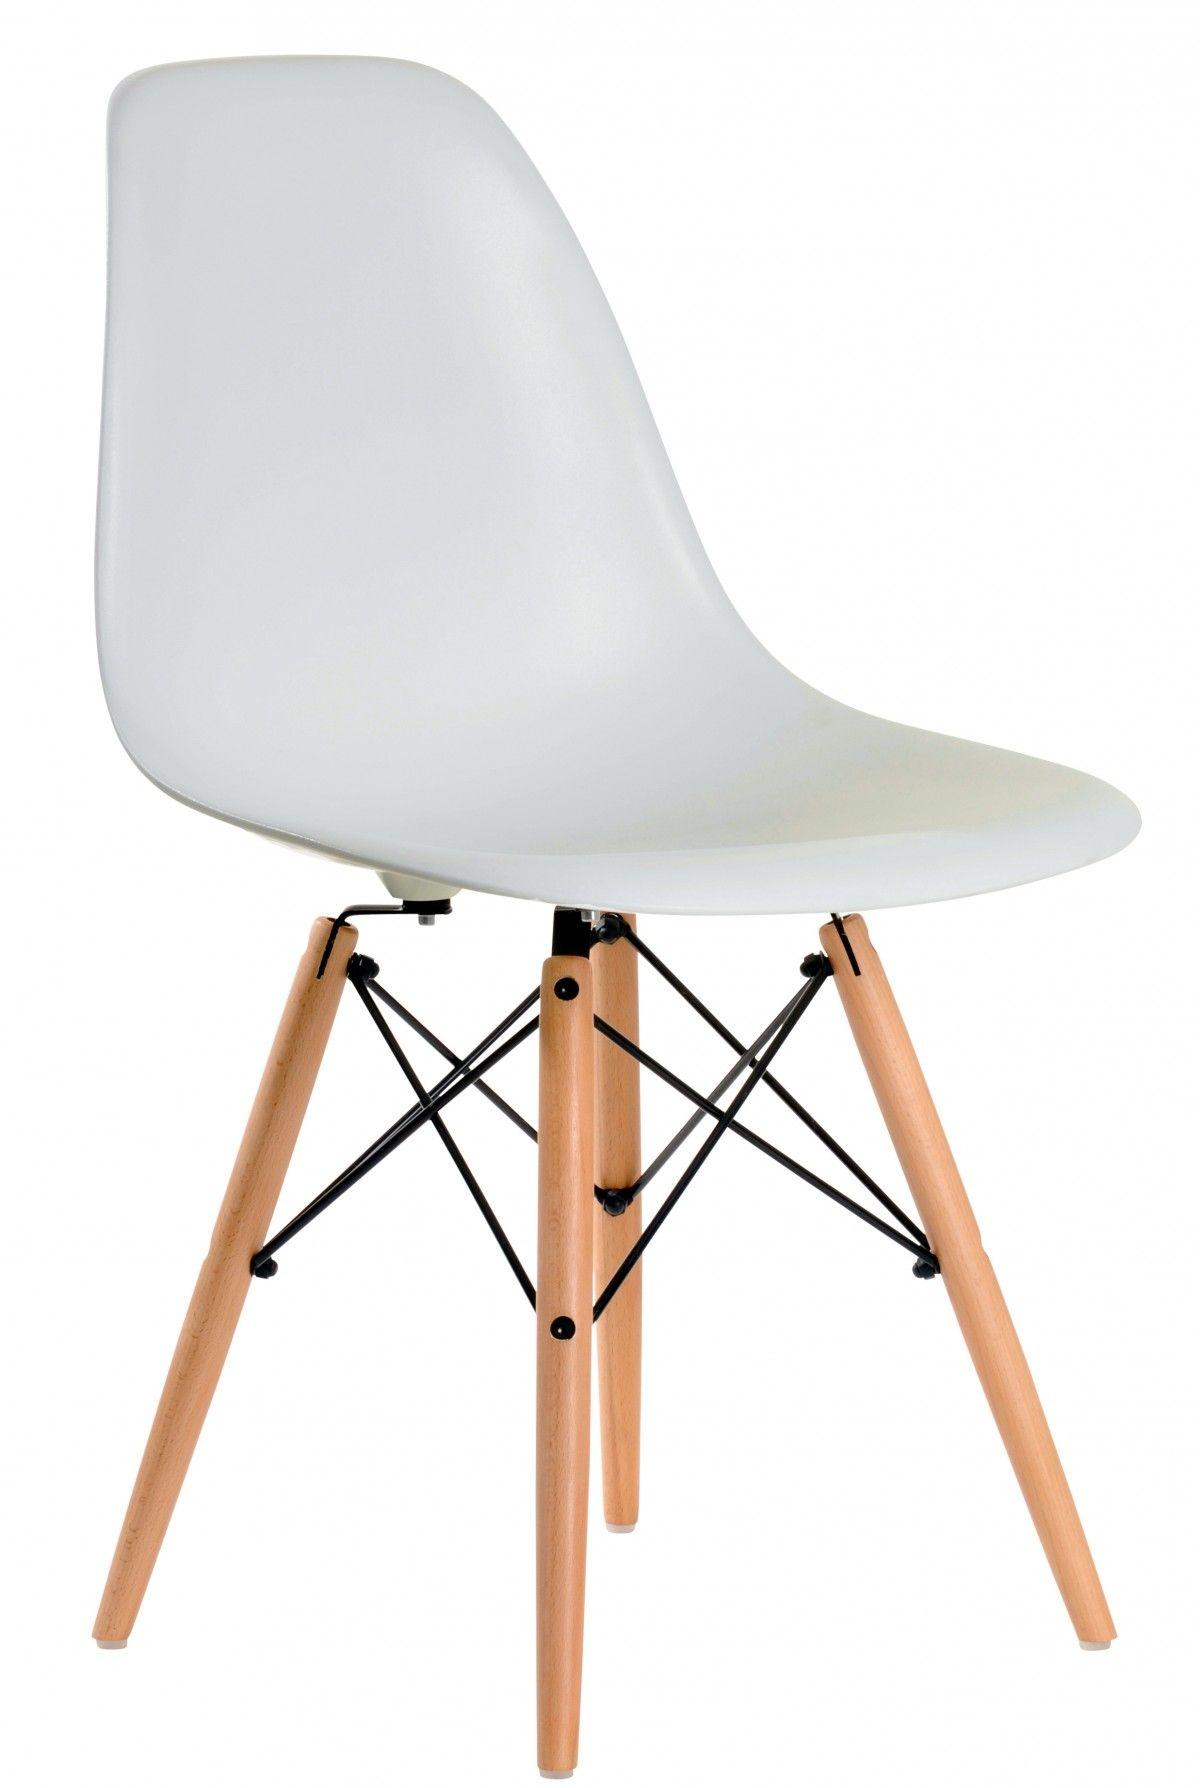 Eames DSW Chair Stühle Stühle